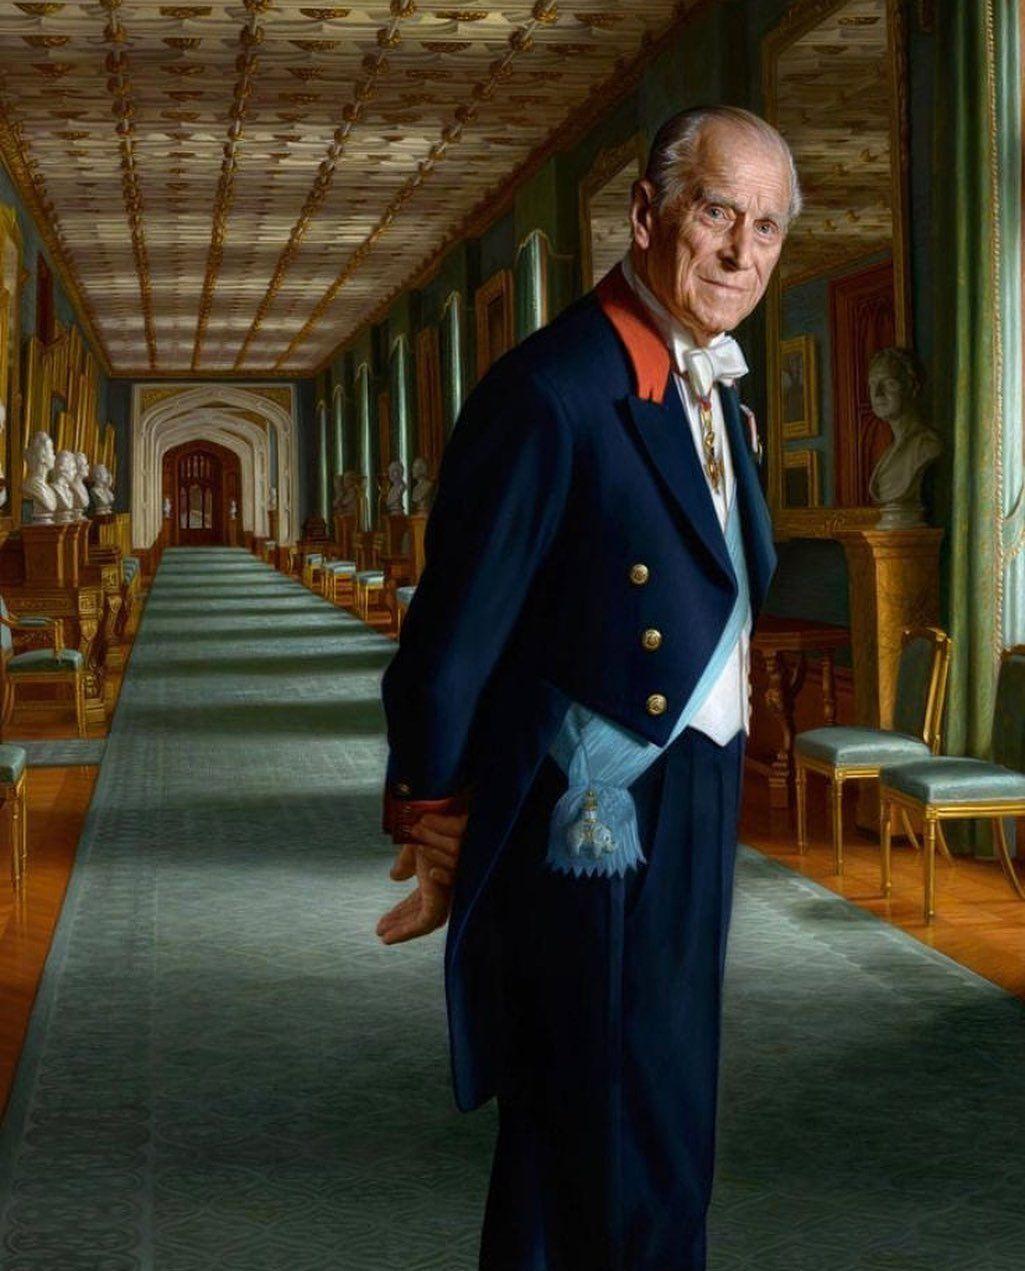 British Royal Monarchy On Instagram Amazing Portrait Of Prince Philip Duke Of Edinburgh Royals Pr Royal Monarchy British Monarchy History Prince Philip